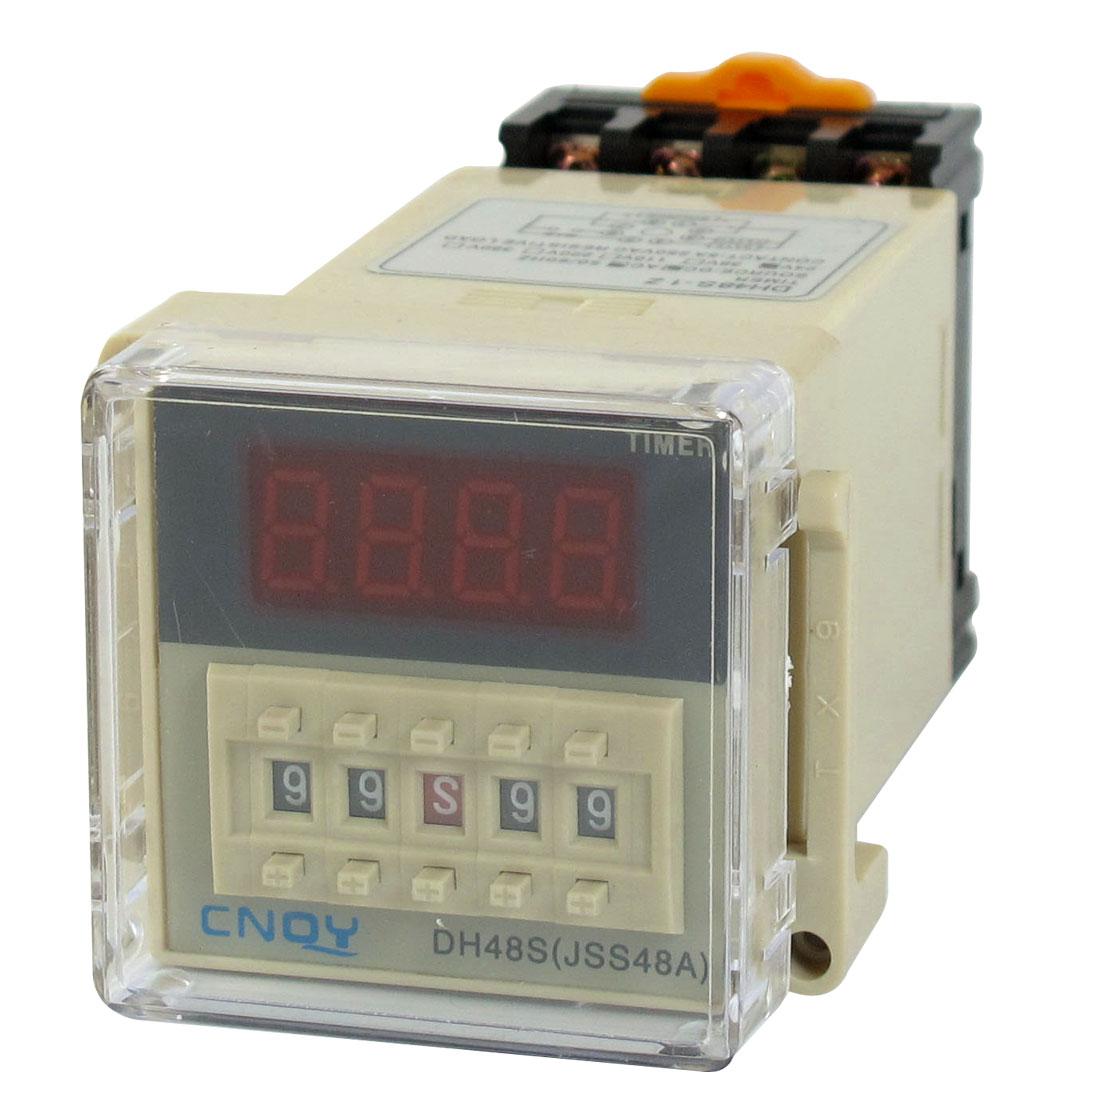 DC 24V SPST 8P 0.01S-99H99M Timer Delay DIN Rail Time Relay DH48S-1Z w Socket